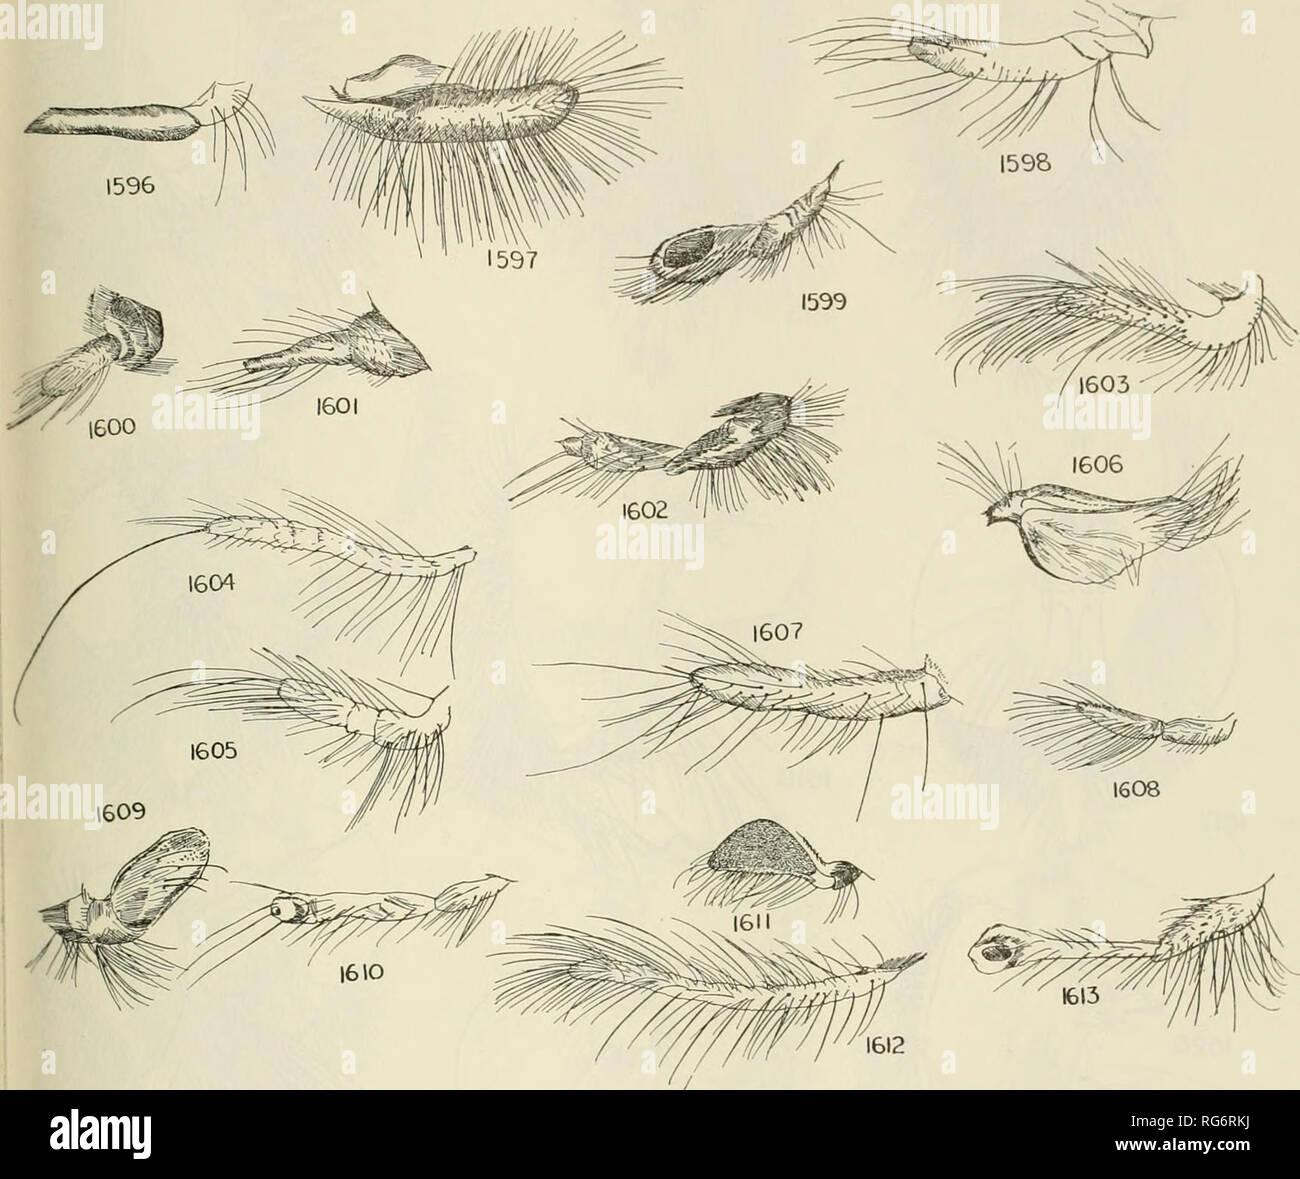 . Bulletin - United States National Museum. Science. ROBBER FLIES OF THE WORLD 747. Figures 1596-1613.—1596, Cryptopogon vernaculus White. 1597, Ctenota molitrix Loew. 1598, Lag- odias laticornis Loew. 1599, Chrysopogon sp. 1600, Cyanonedys sp. 1601, Cyanonedys lugubris Hermann. 1602, Acrochordomerus aeneiis Her- mann. 1603, Pararatus macrostylus Loew. 1604, Lecania genitalis Bromley. 1605, Dysclytus firma- tus Walker. 1606, Systropalpus aurivulpes, new species. 1607, Enigmomorpheus paradoxus Her- mann. 1608, Dassylina fulvithorax Bromley, 1609, Hyperechia sp. 1610, Smeringolaphria sp. 1611, B - Stock Image